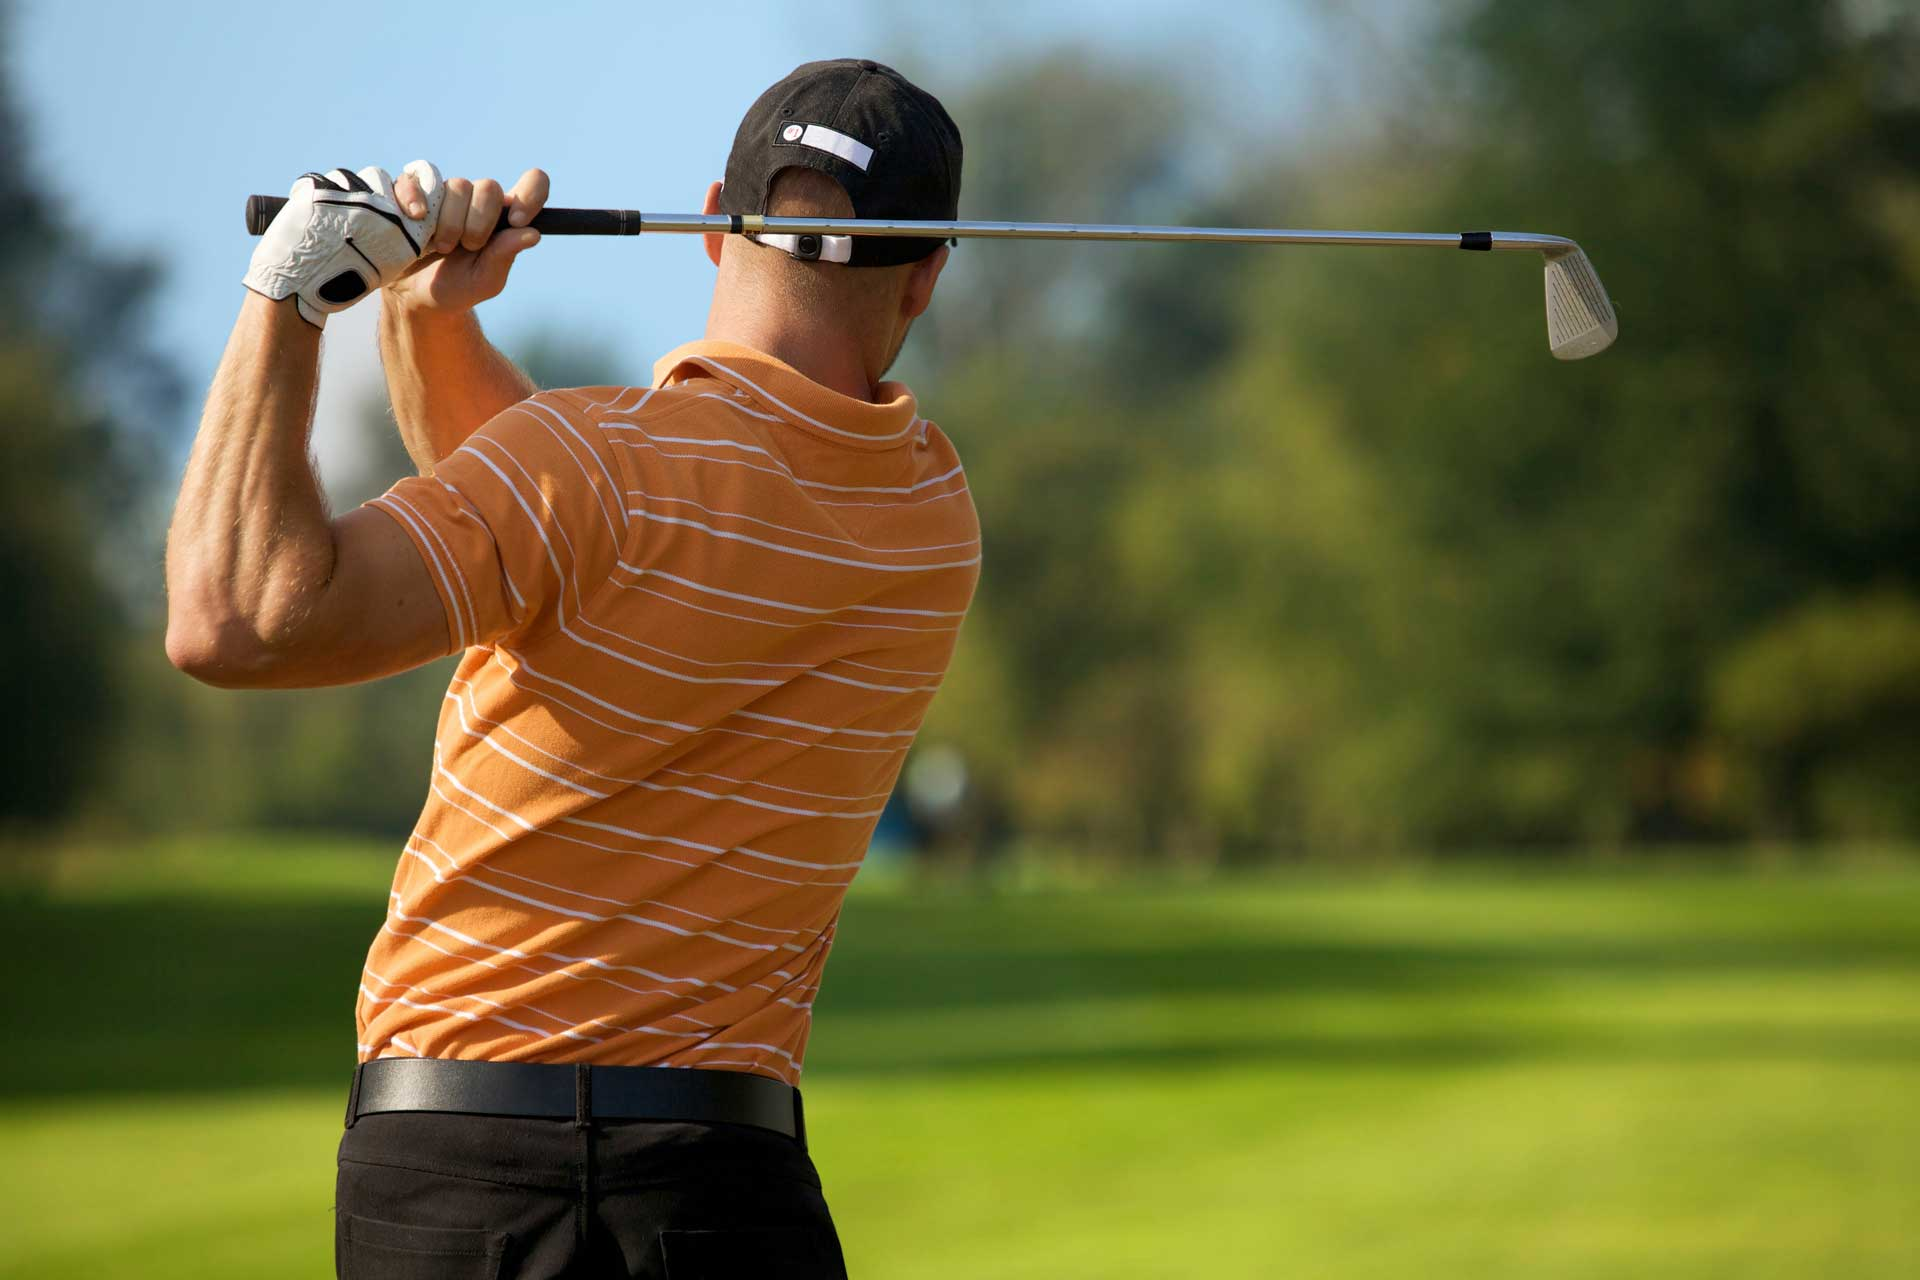 Golfer swinging his club on the fairway